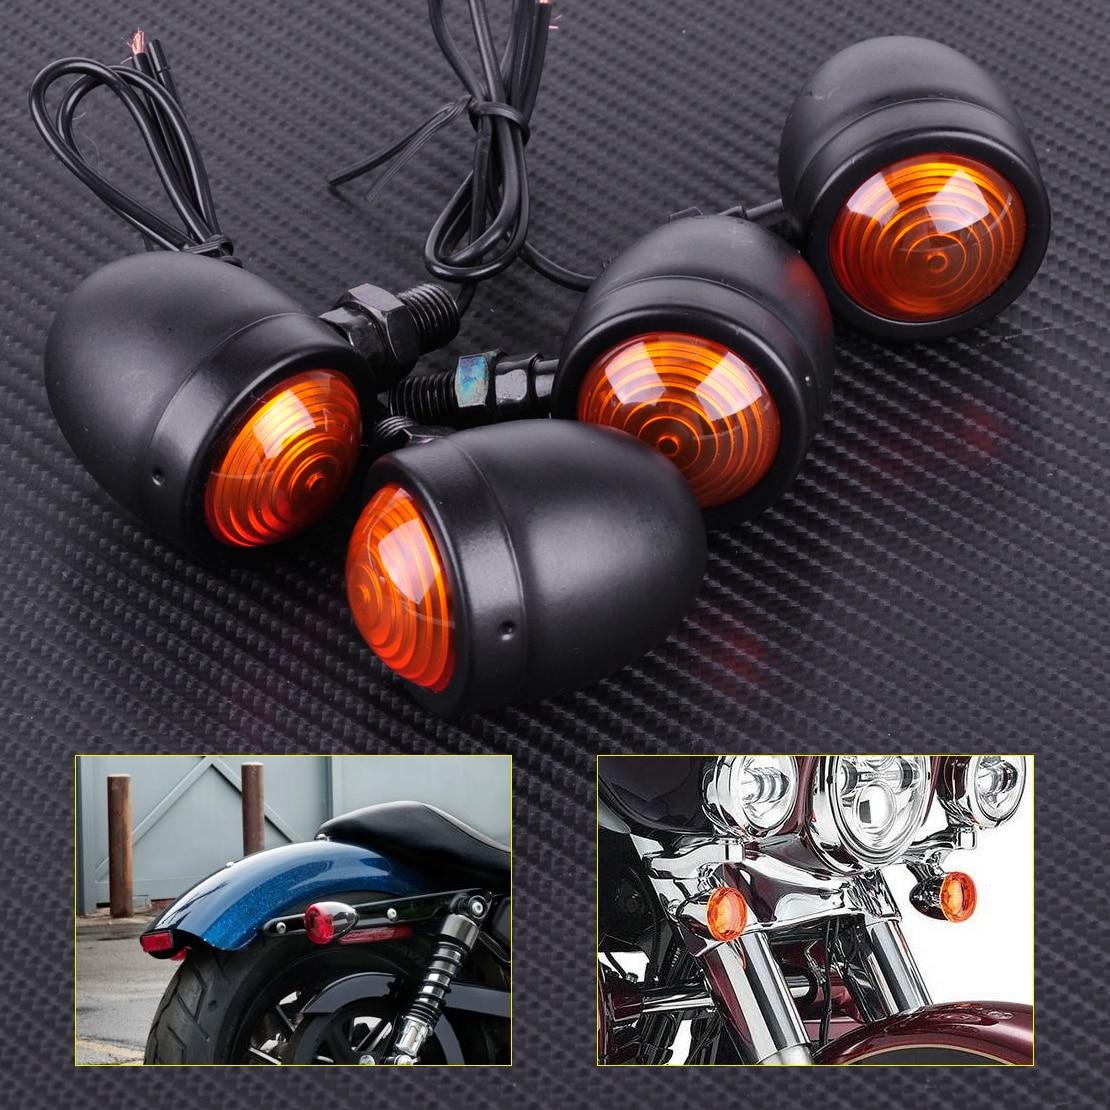 CITALL Moto 4 pcs 12 V Noir Bullet Turn Signal Indicateur Lumières Lampe Fit pour Harley Honda Bobber Chopper Yamaha Suzuki ATV